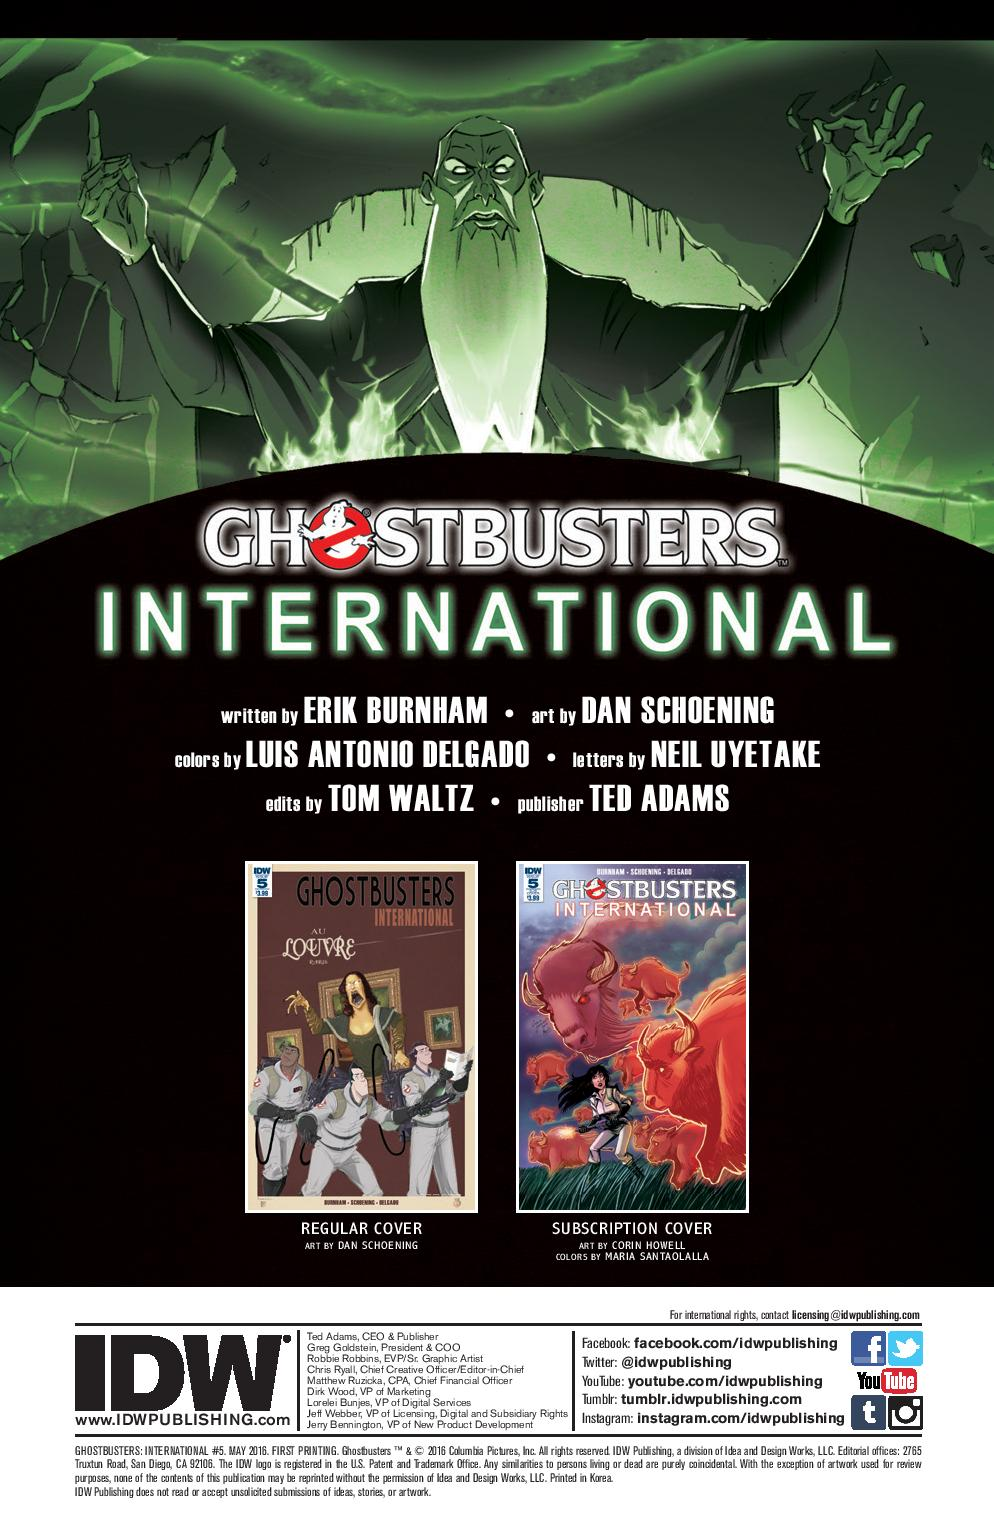 Ghostbusters_International_05-pr-page-002